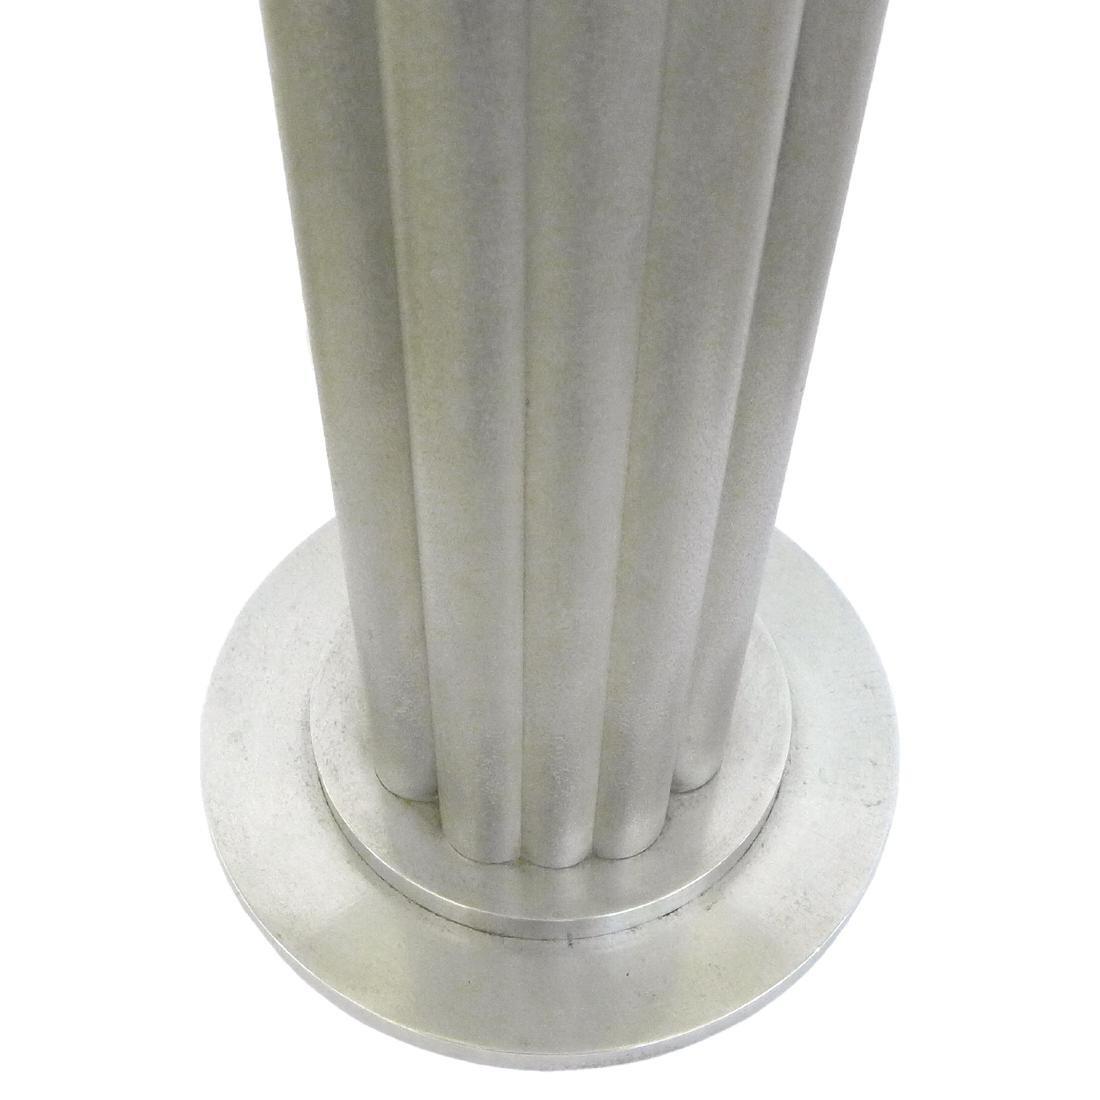 Art Deco Table Lamps (2) - 2